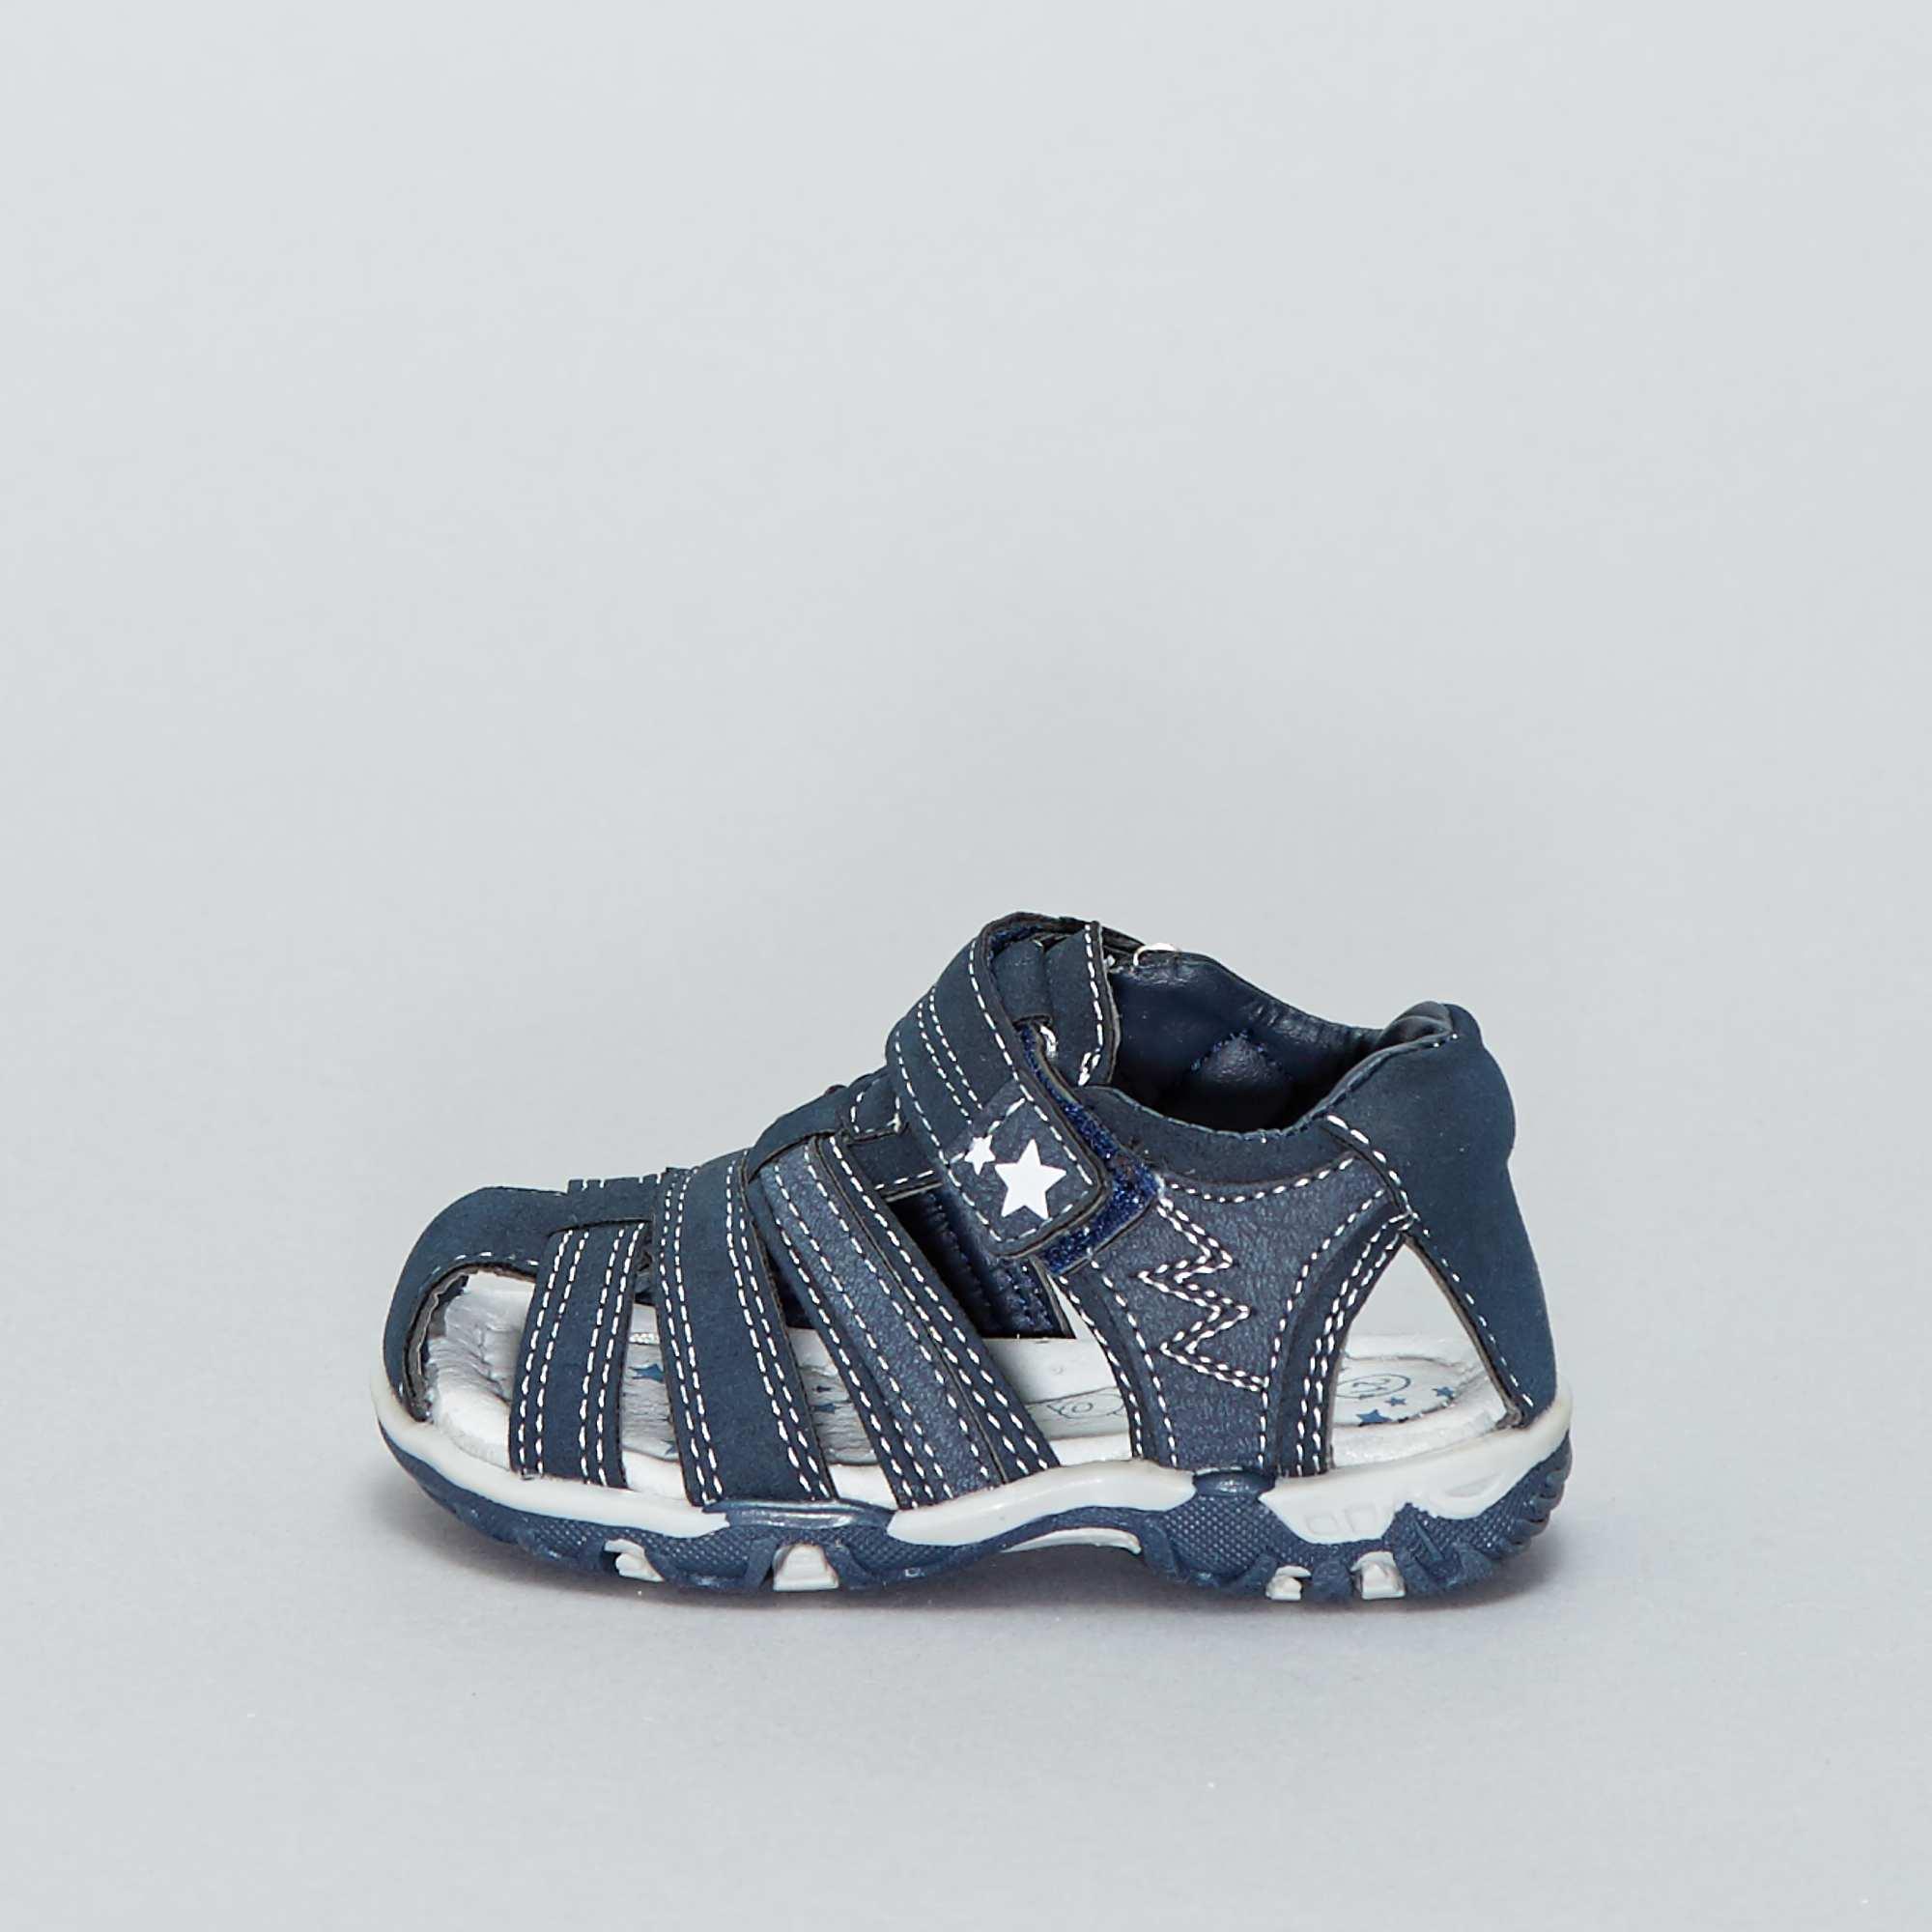 6c42052a152d7 Sandalias deportivas con velcros Bebé niño - azul navy - Kiabi - 20